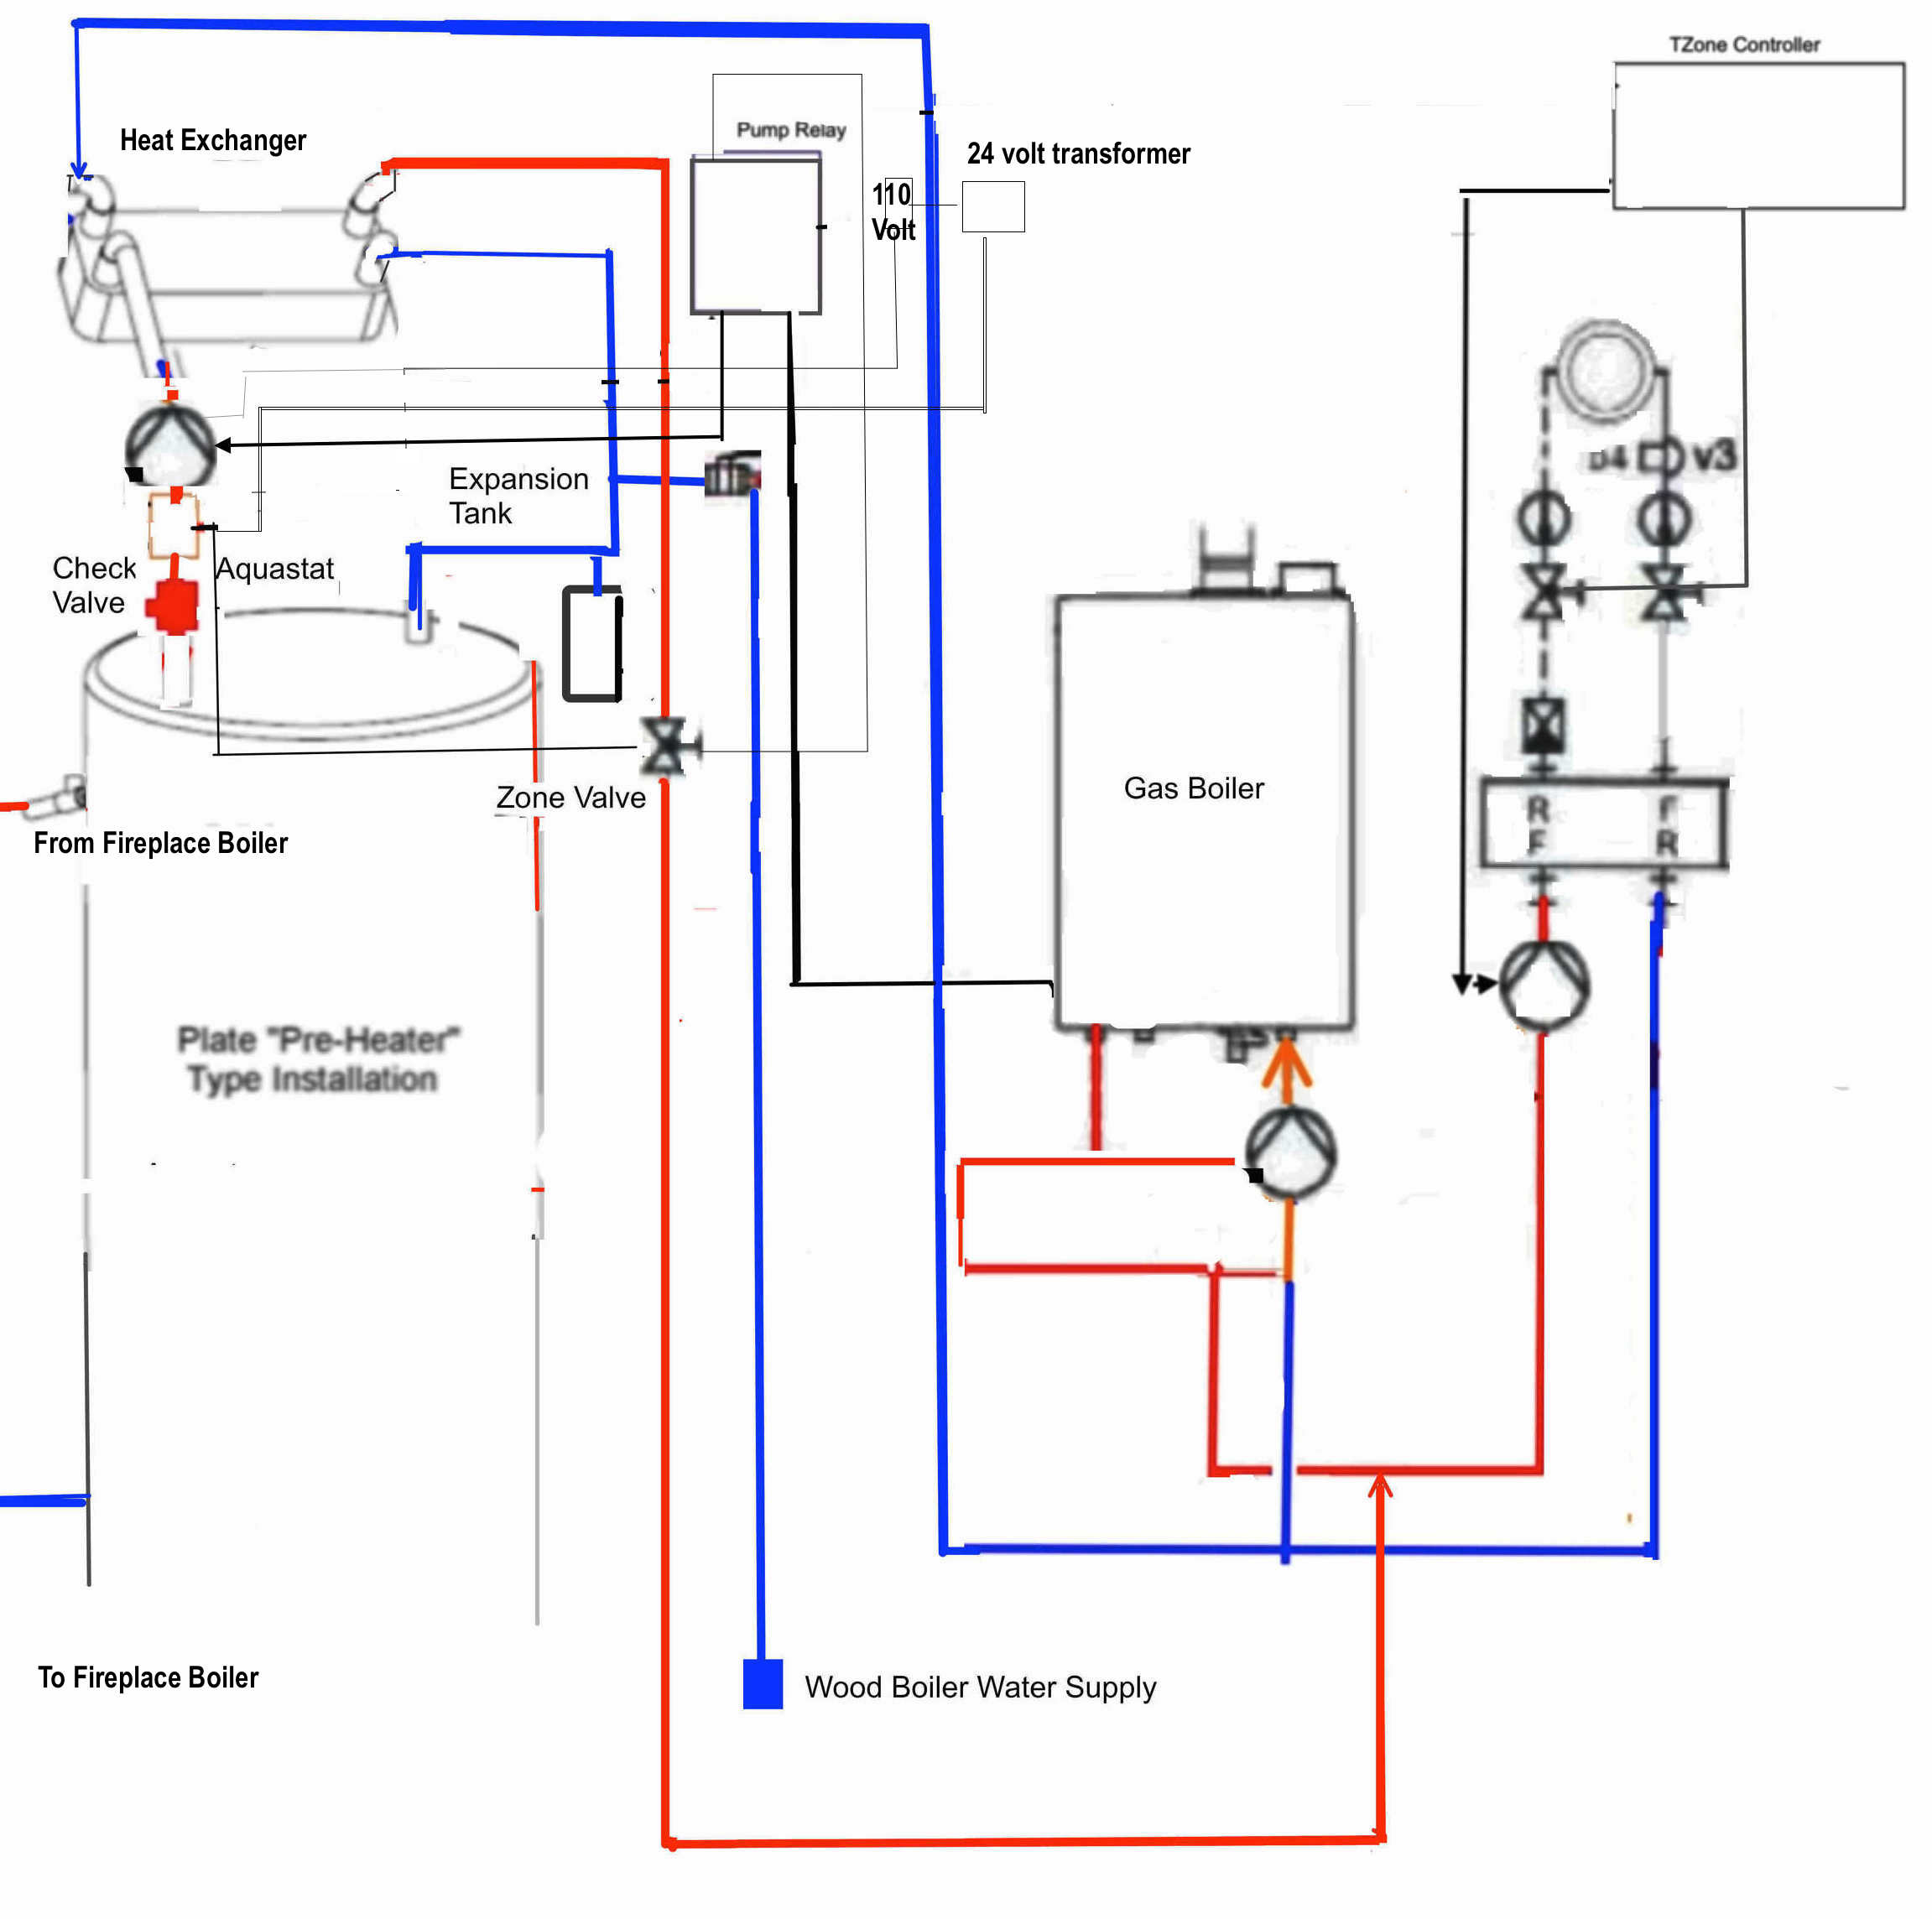 Sensational Honeywell Vfd Wiring Diagram Basic Electronics Wiring Diagram Wiring Database Pengheclesi4X4Andersnl